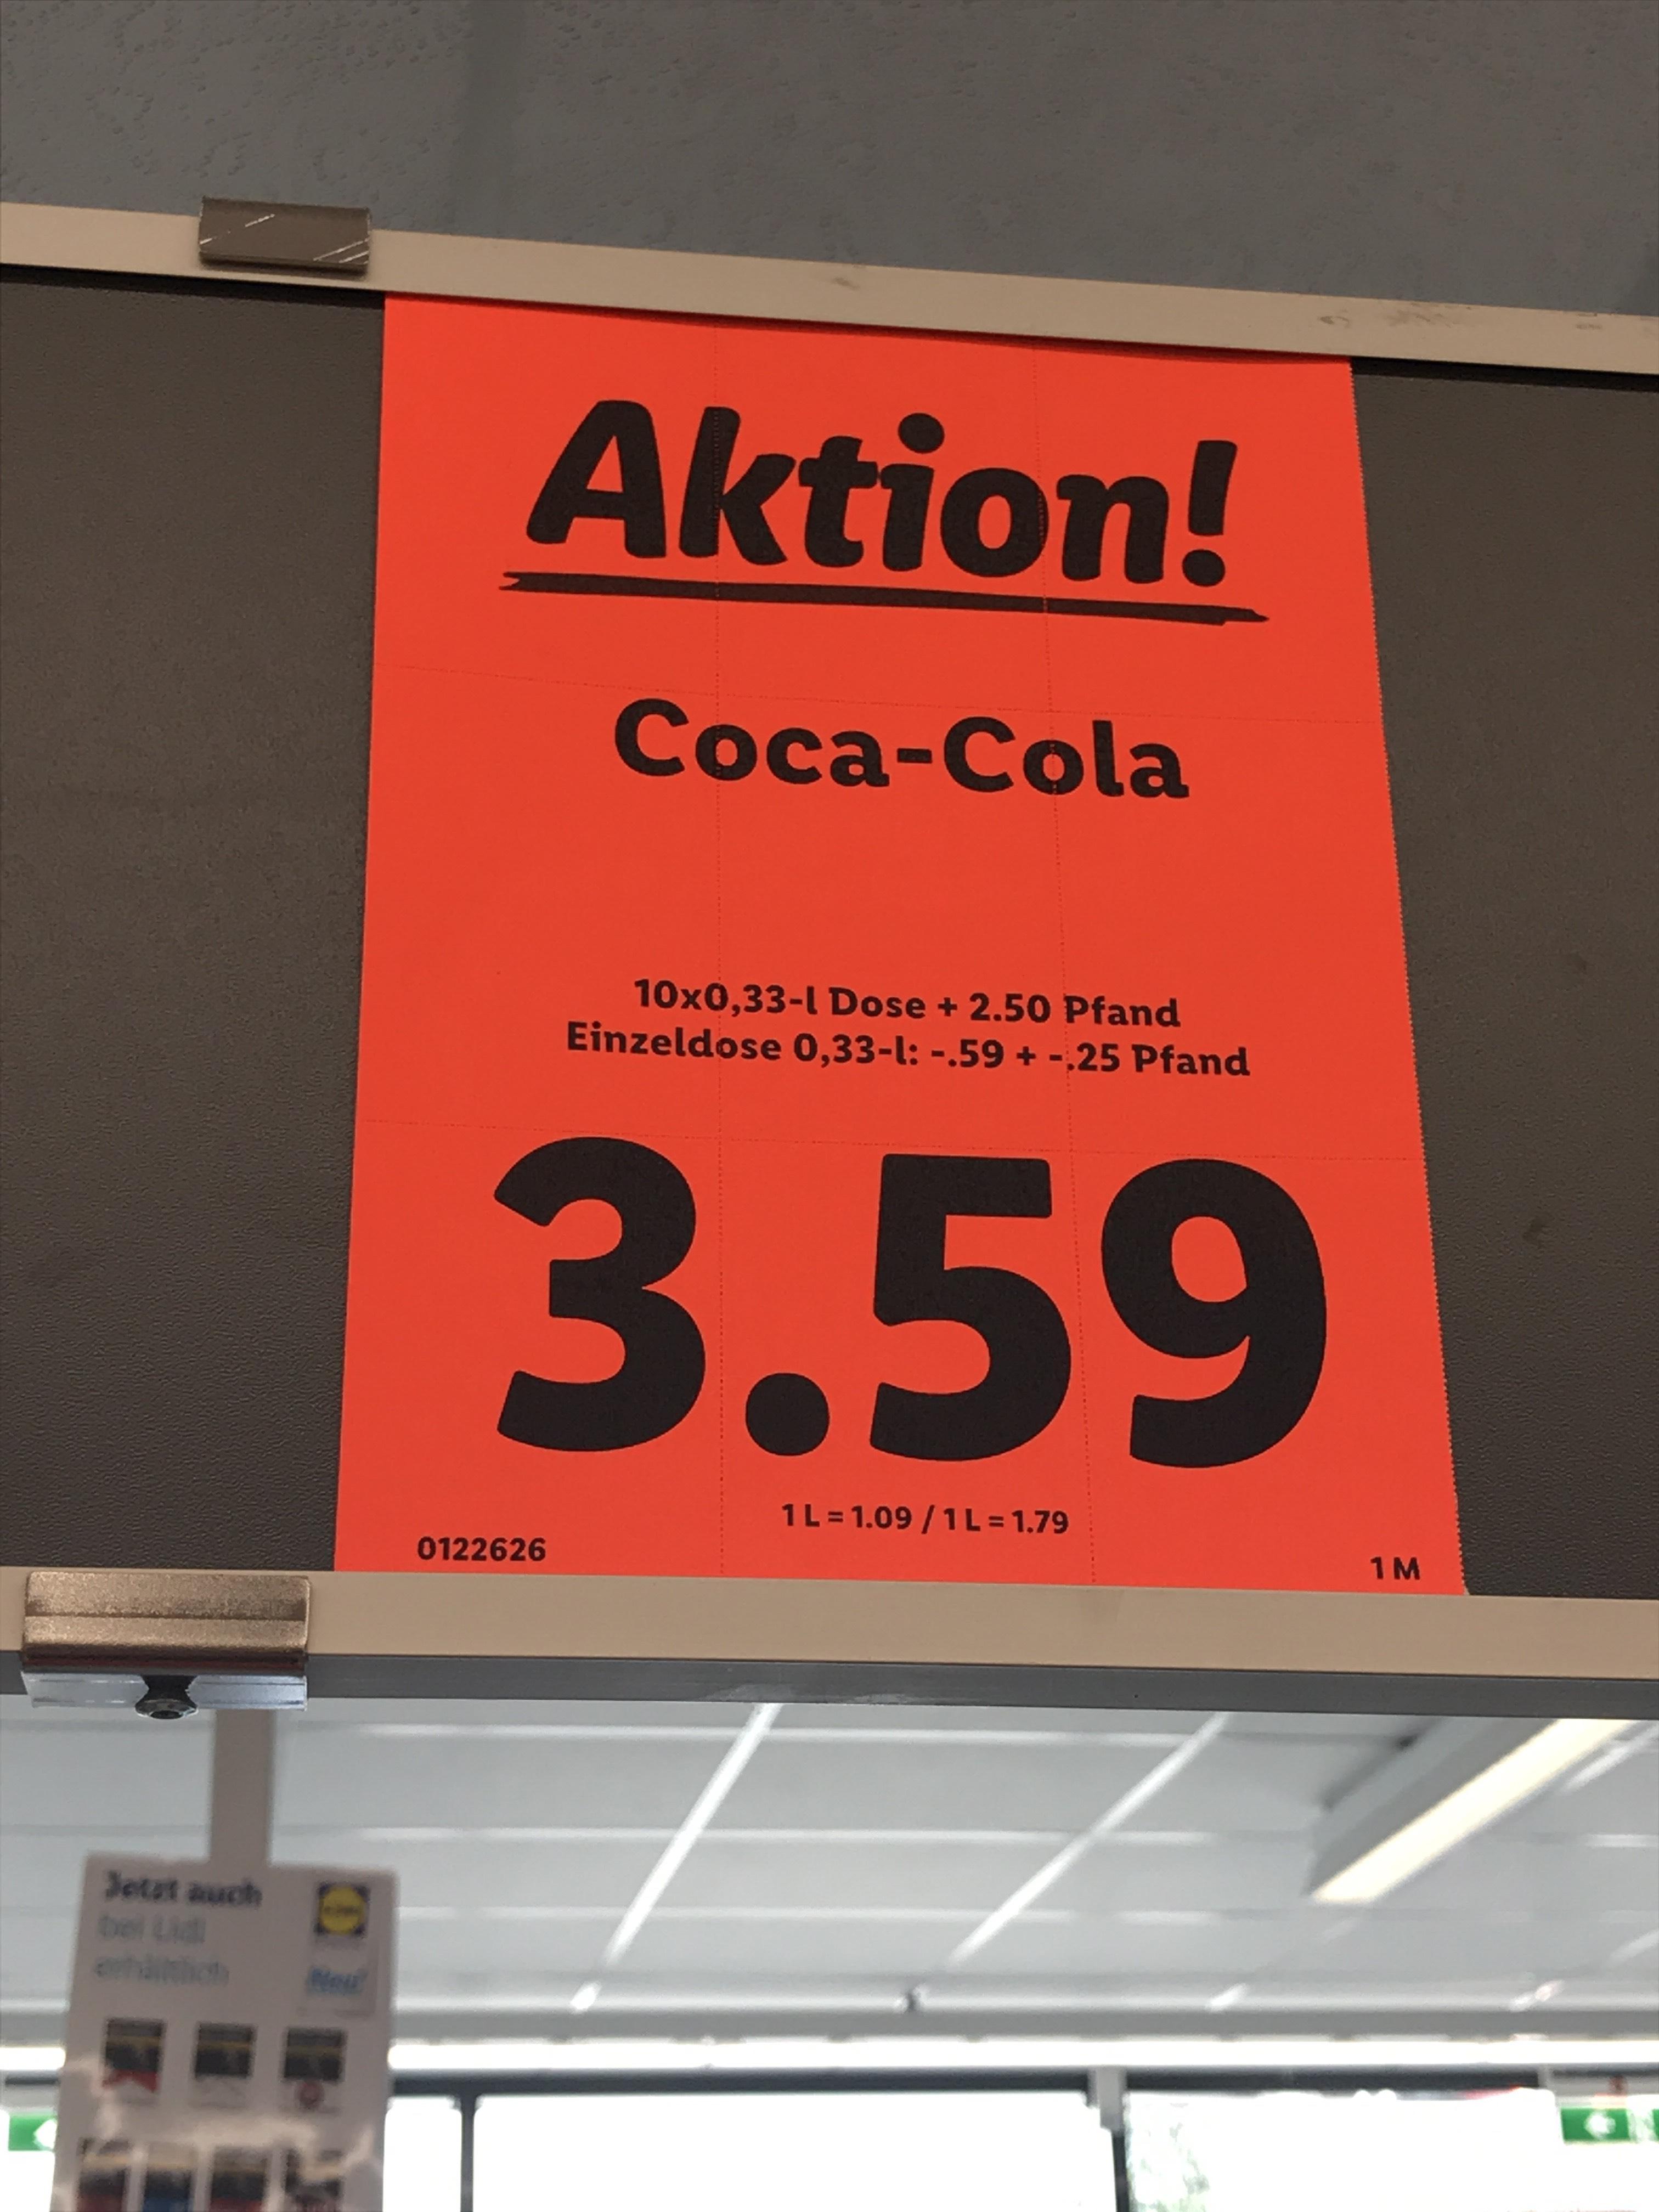 [LIDL] 10 x 330ml Coca-Cola + 2,50€ Pfand